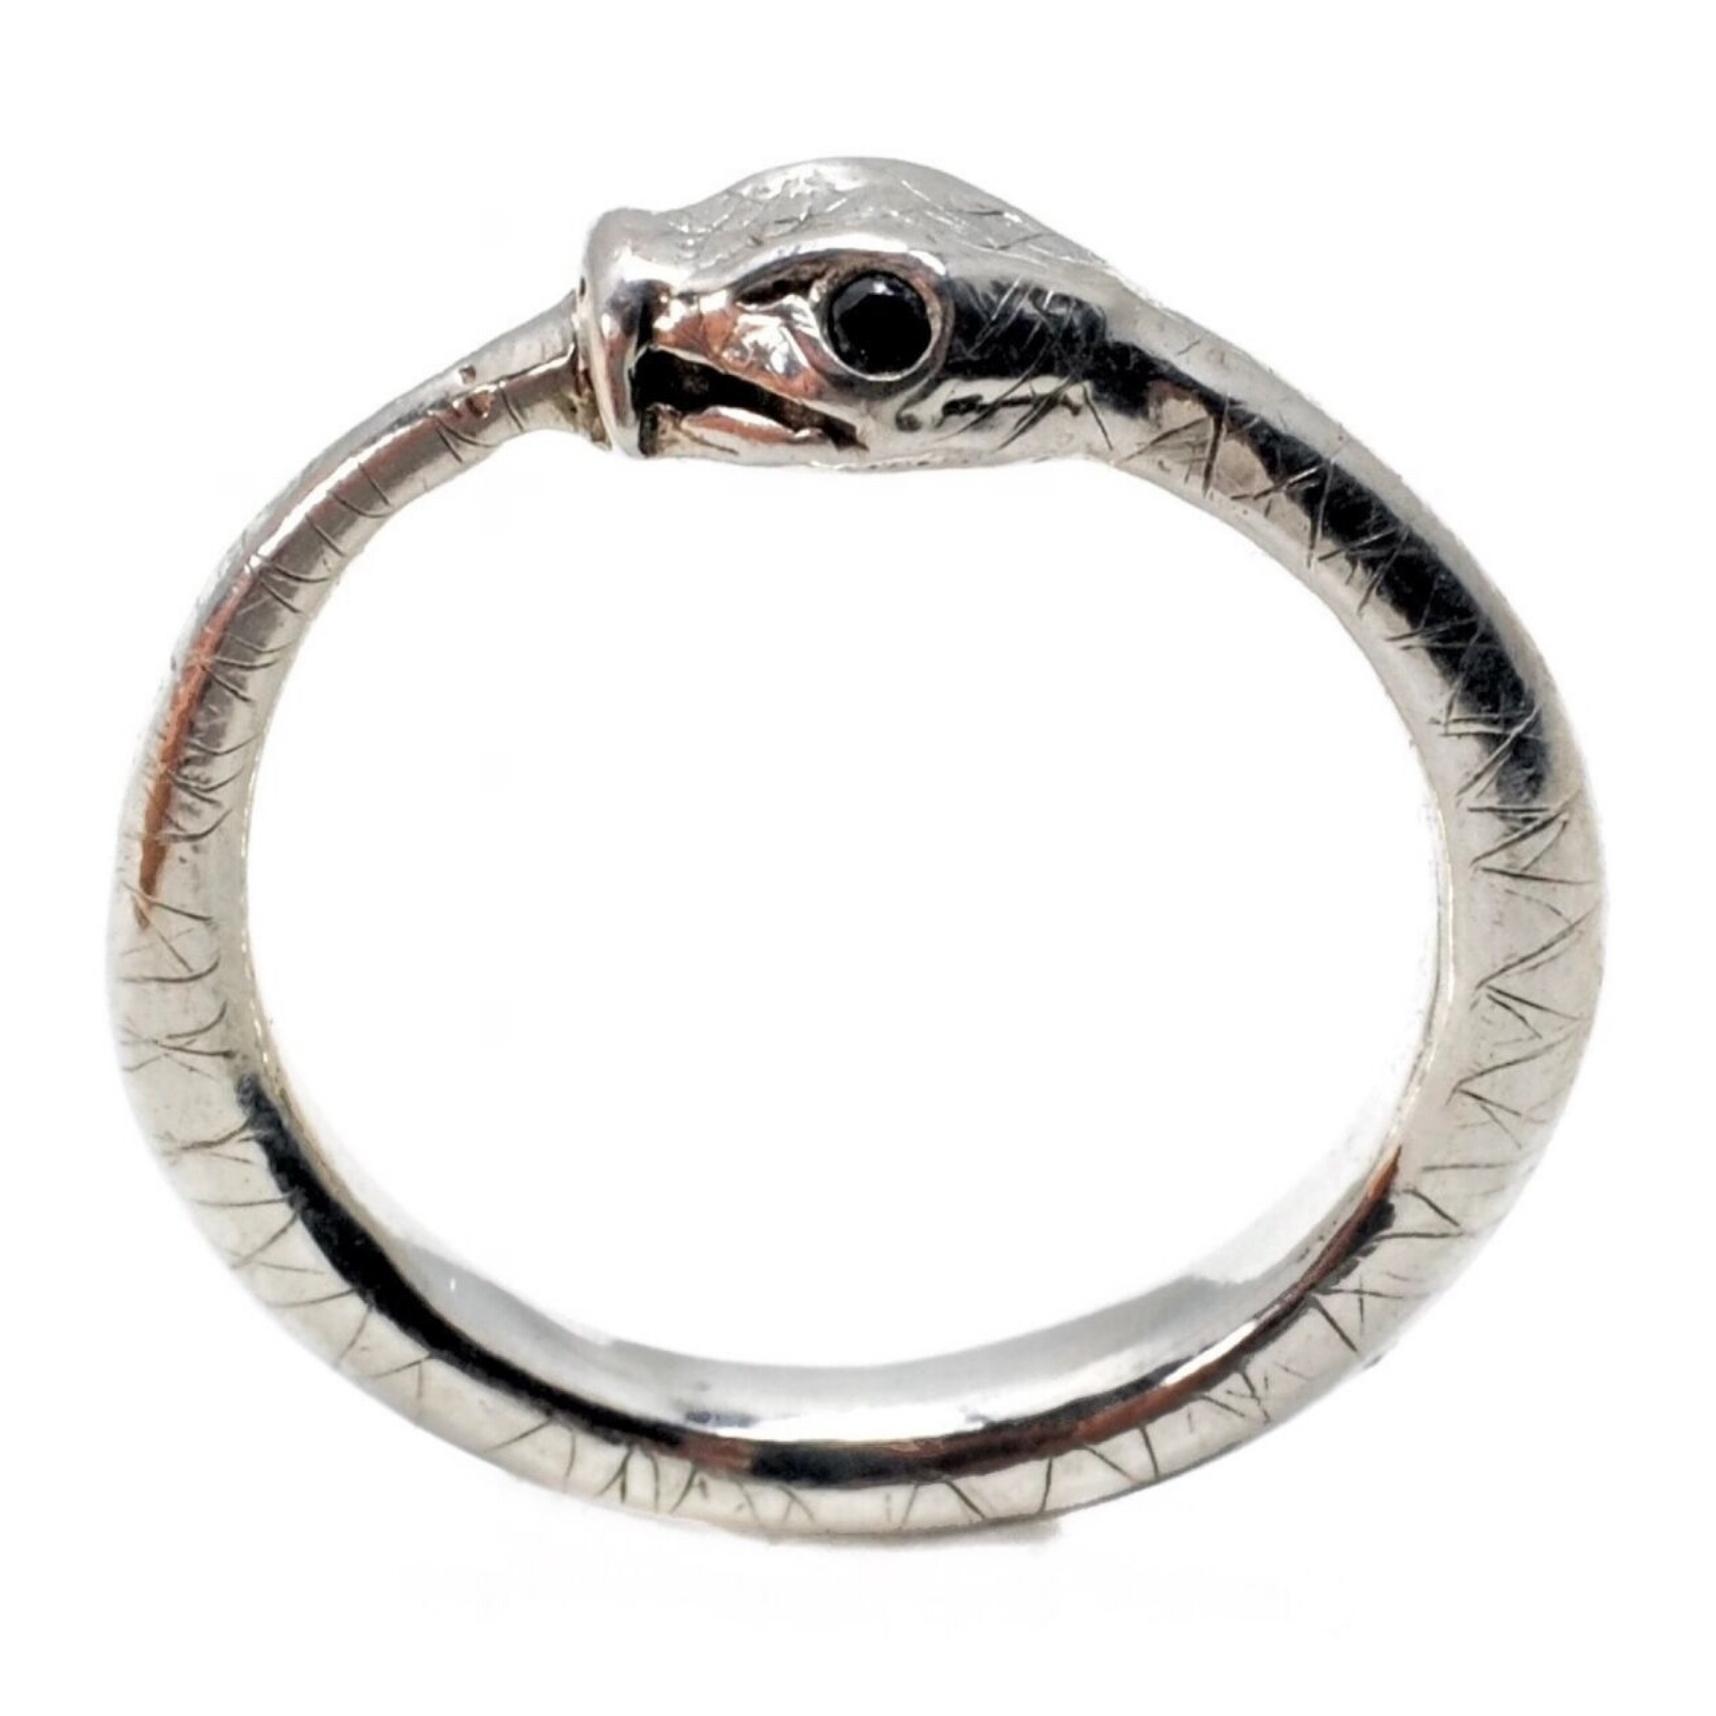 Ouroboros Ring 3_preview.jpeg